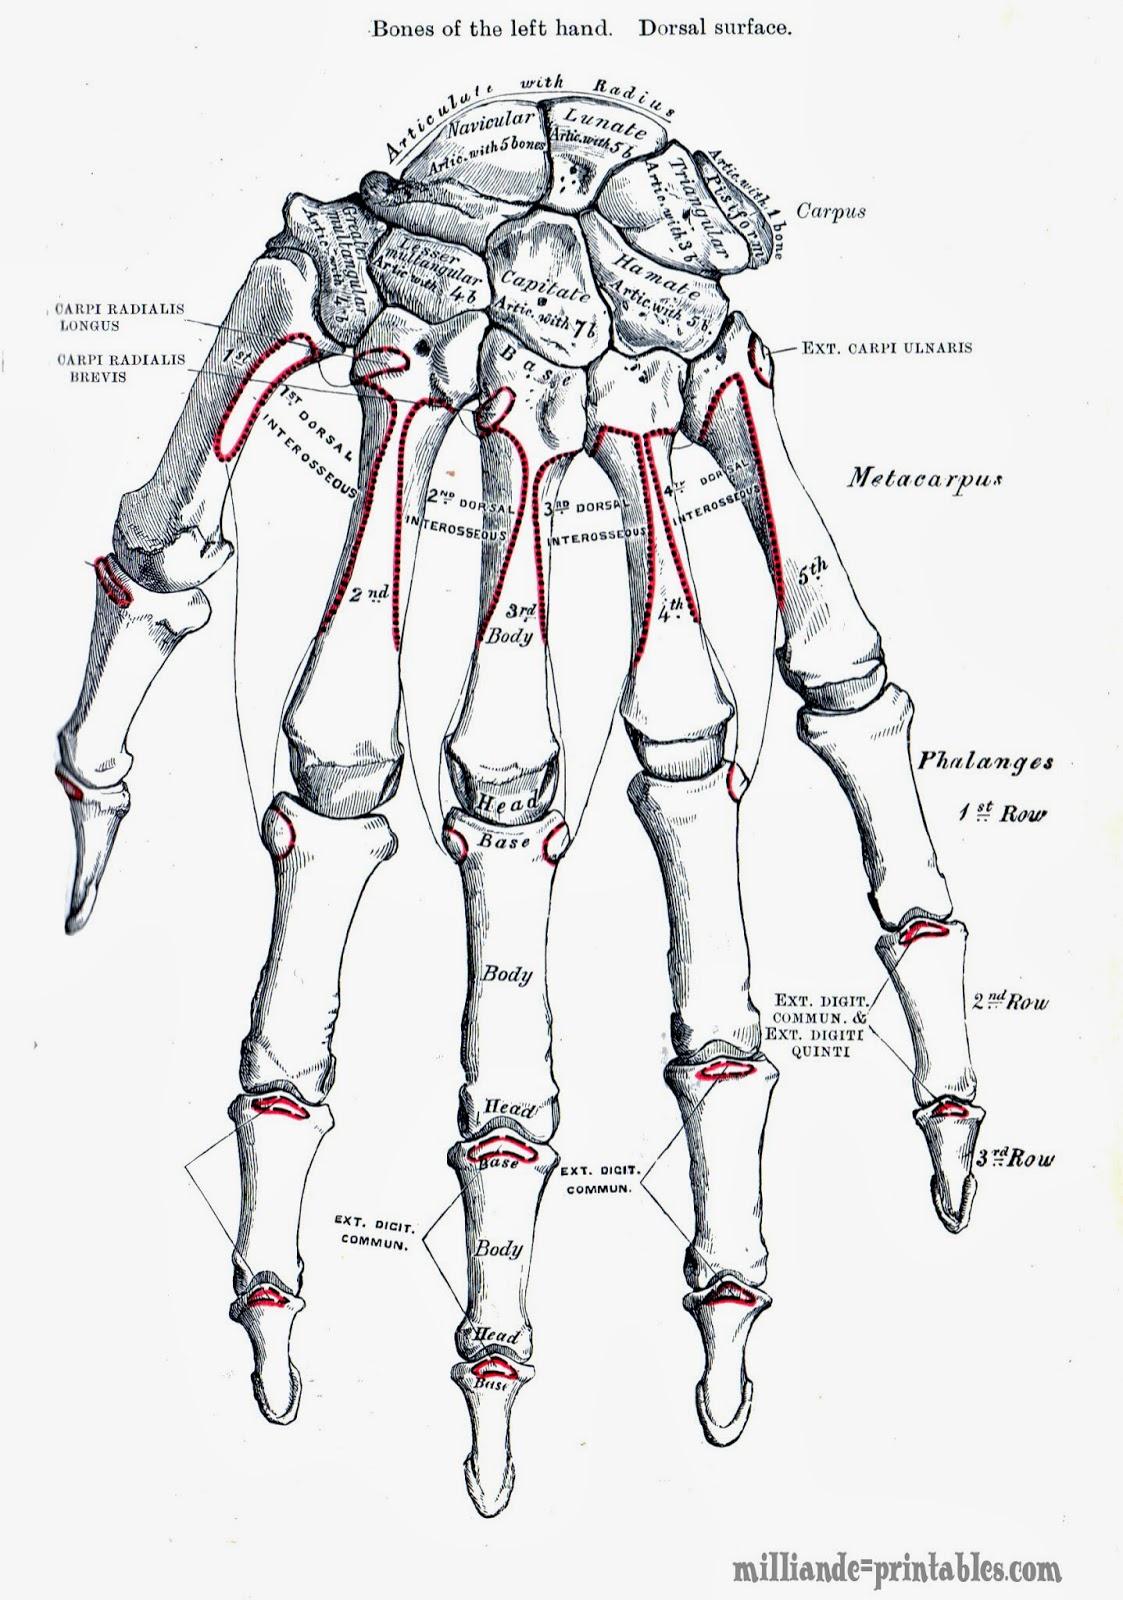 Human Anatomy Vintage Left Anatomy of The Human Hand